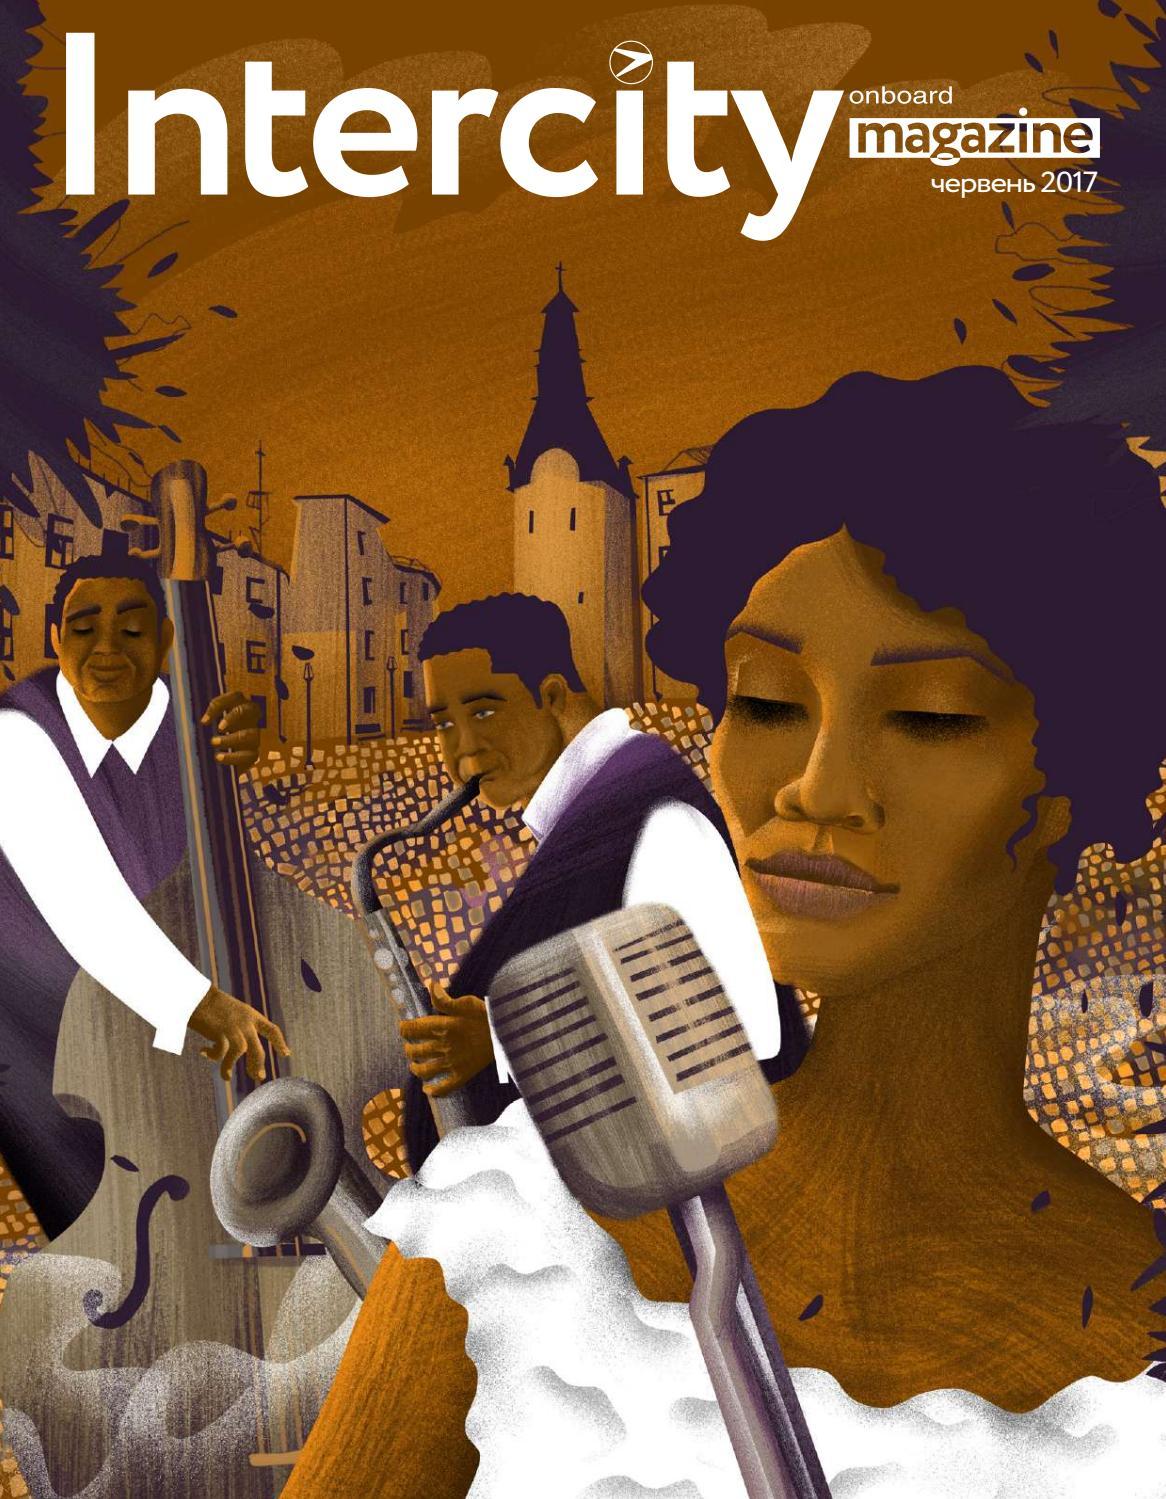 2c320518e0487b Intercity onboard magazine червень/2017 by ICOM - issuu